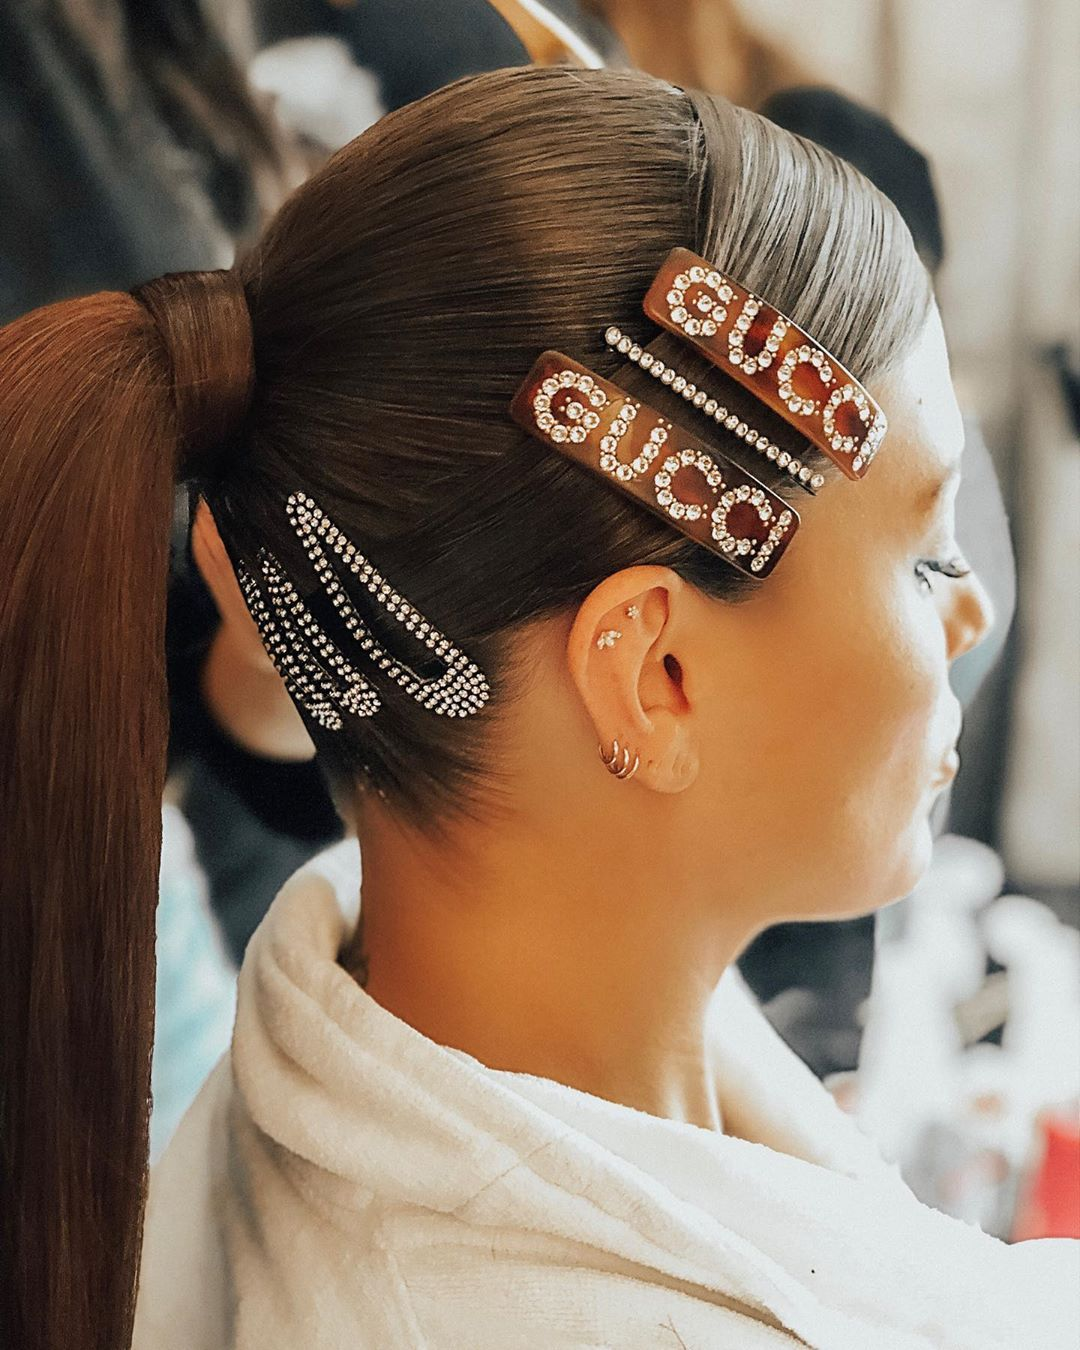 Image result for Ashley Graham hair clip